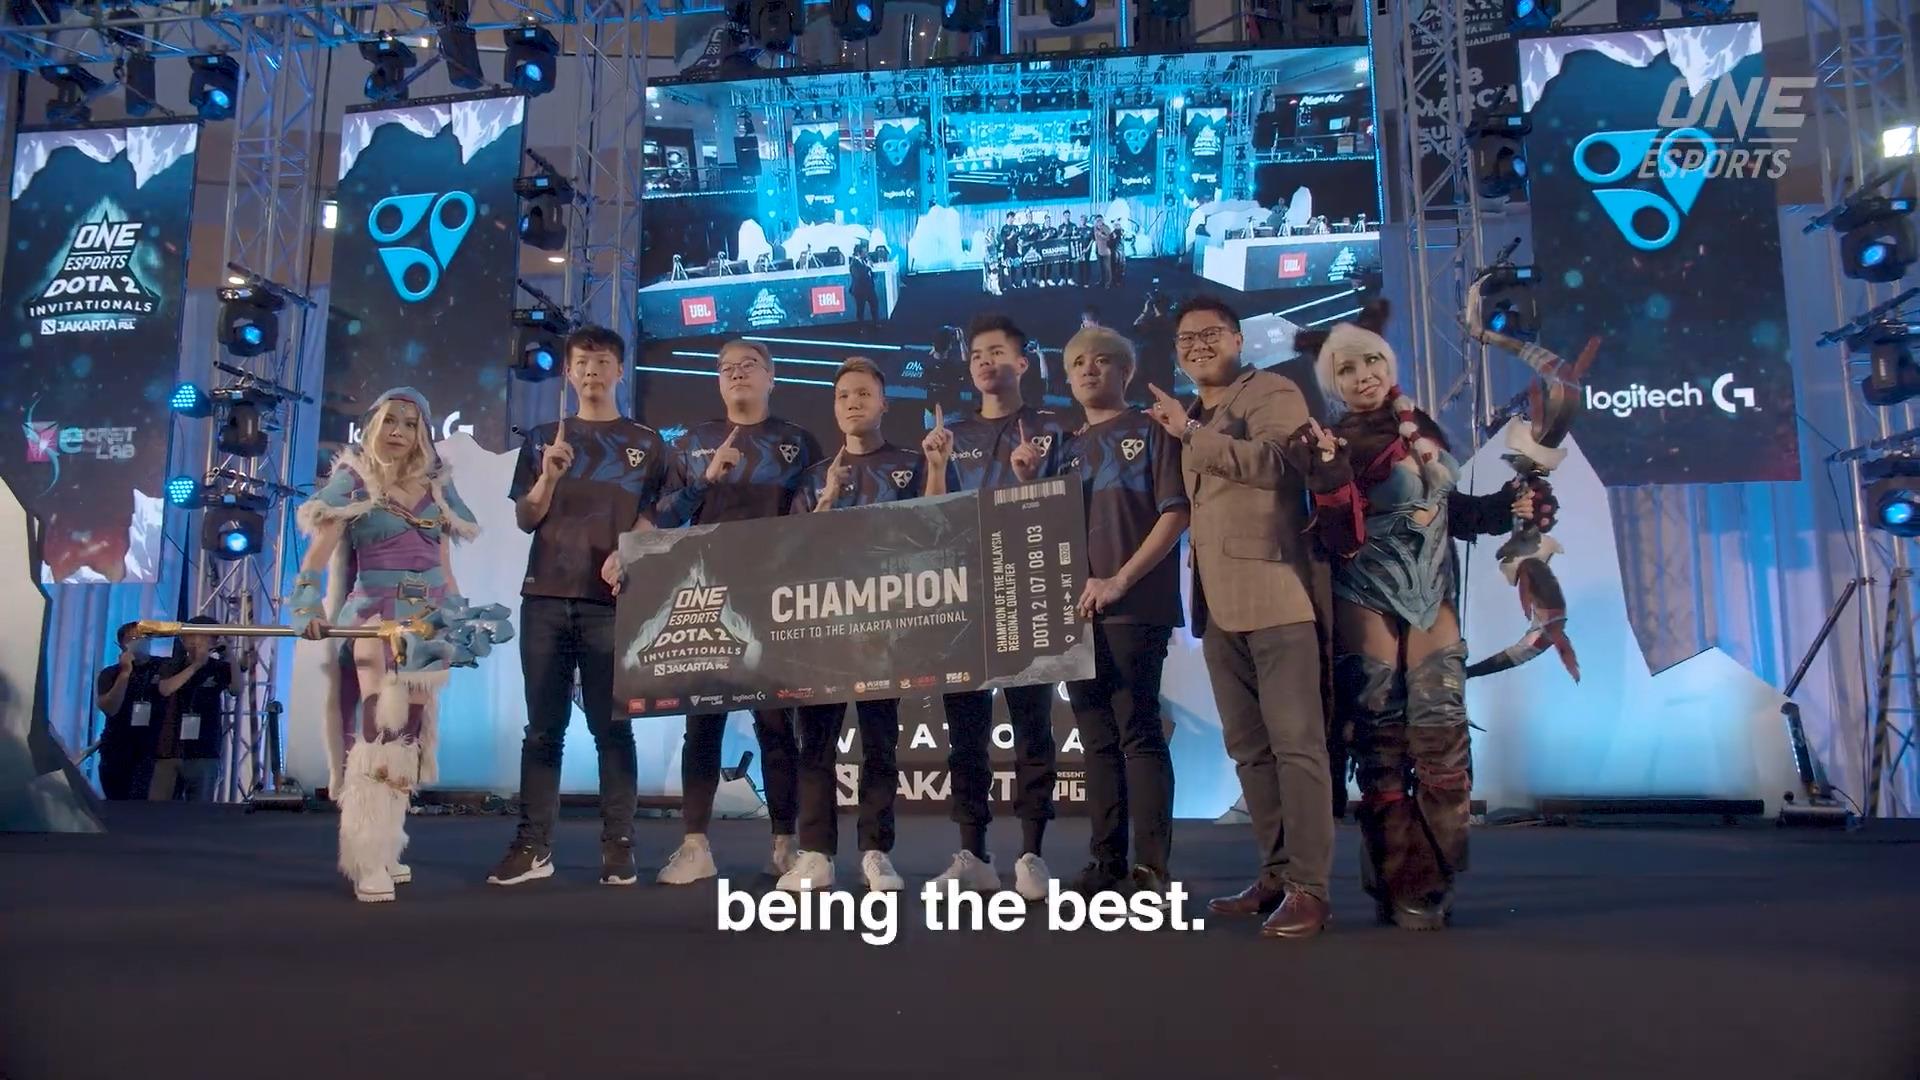 Singaporean Esports Organization, Reality Rift, Closes Its Dota 2 Team Amid COVID-19 And 'Valve's Management'